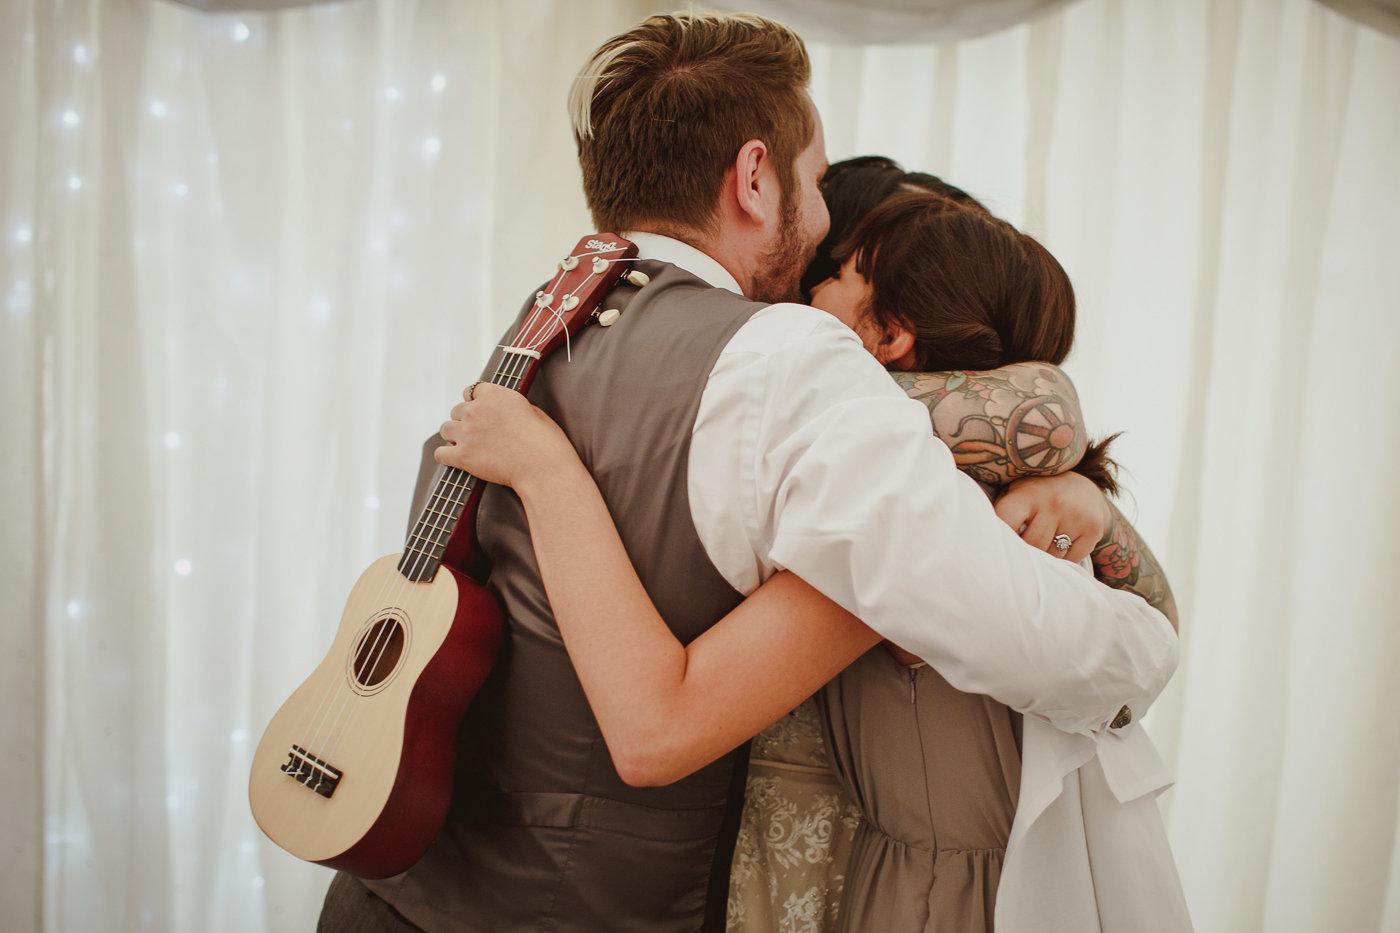 berkshire-wedding-photographer-34.jpg